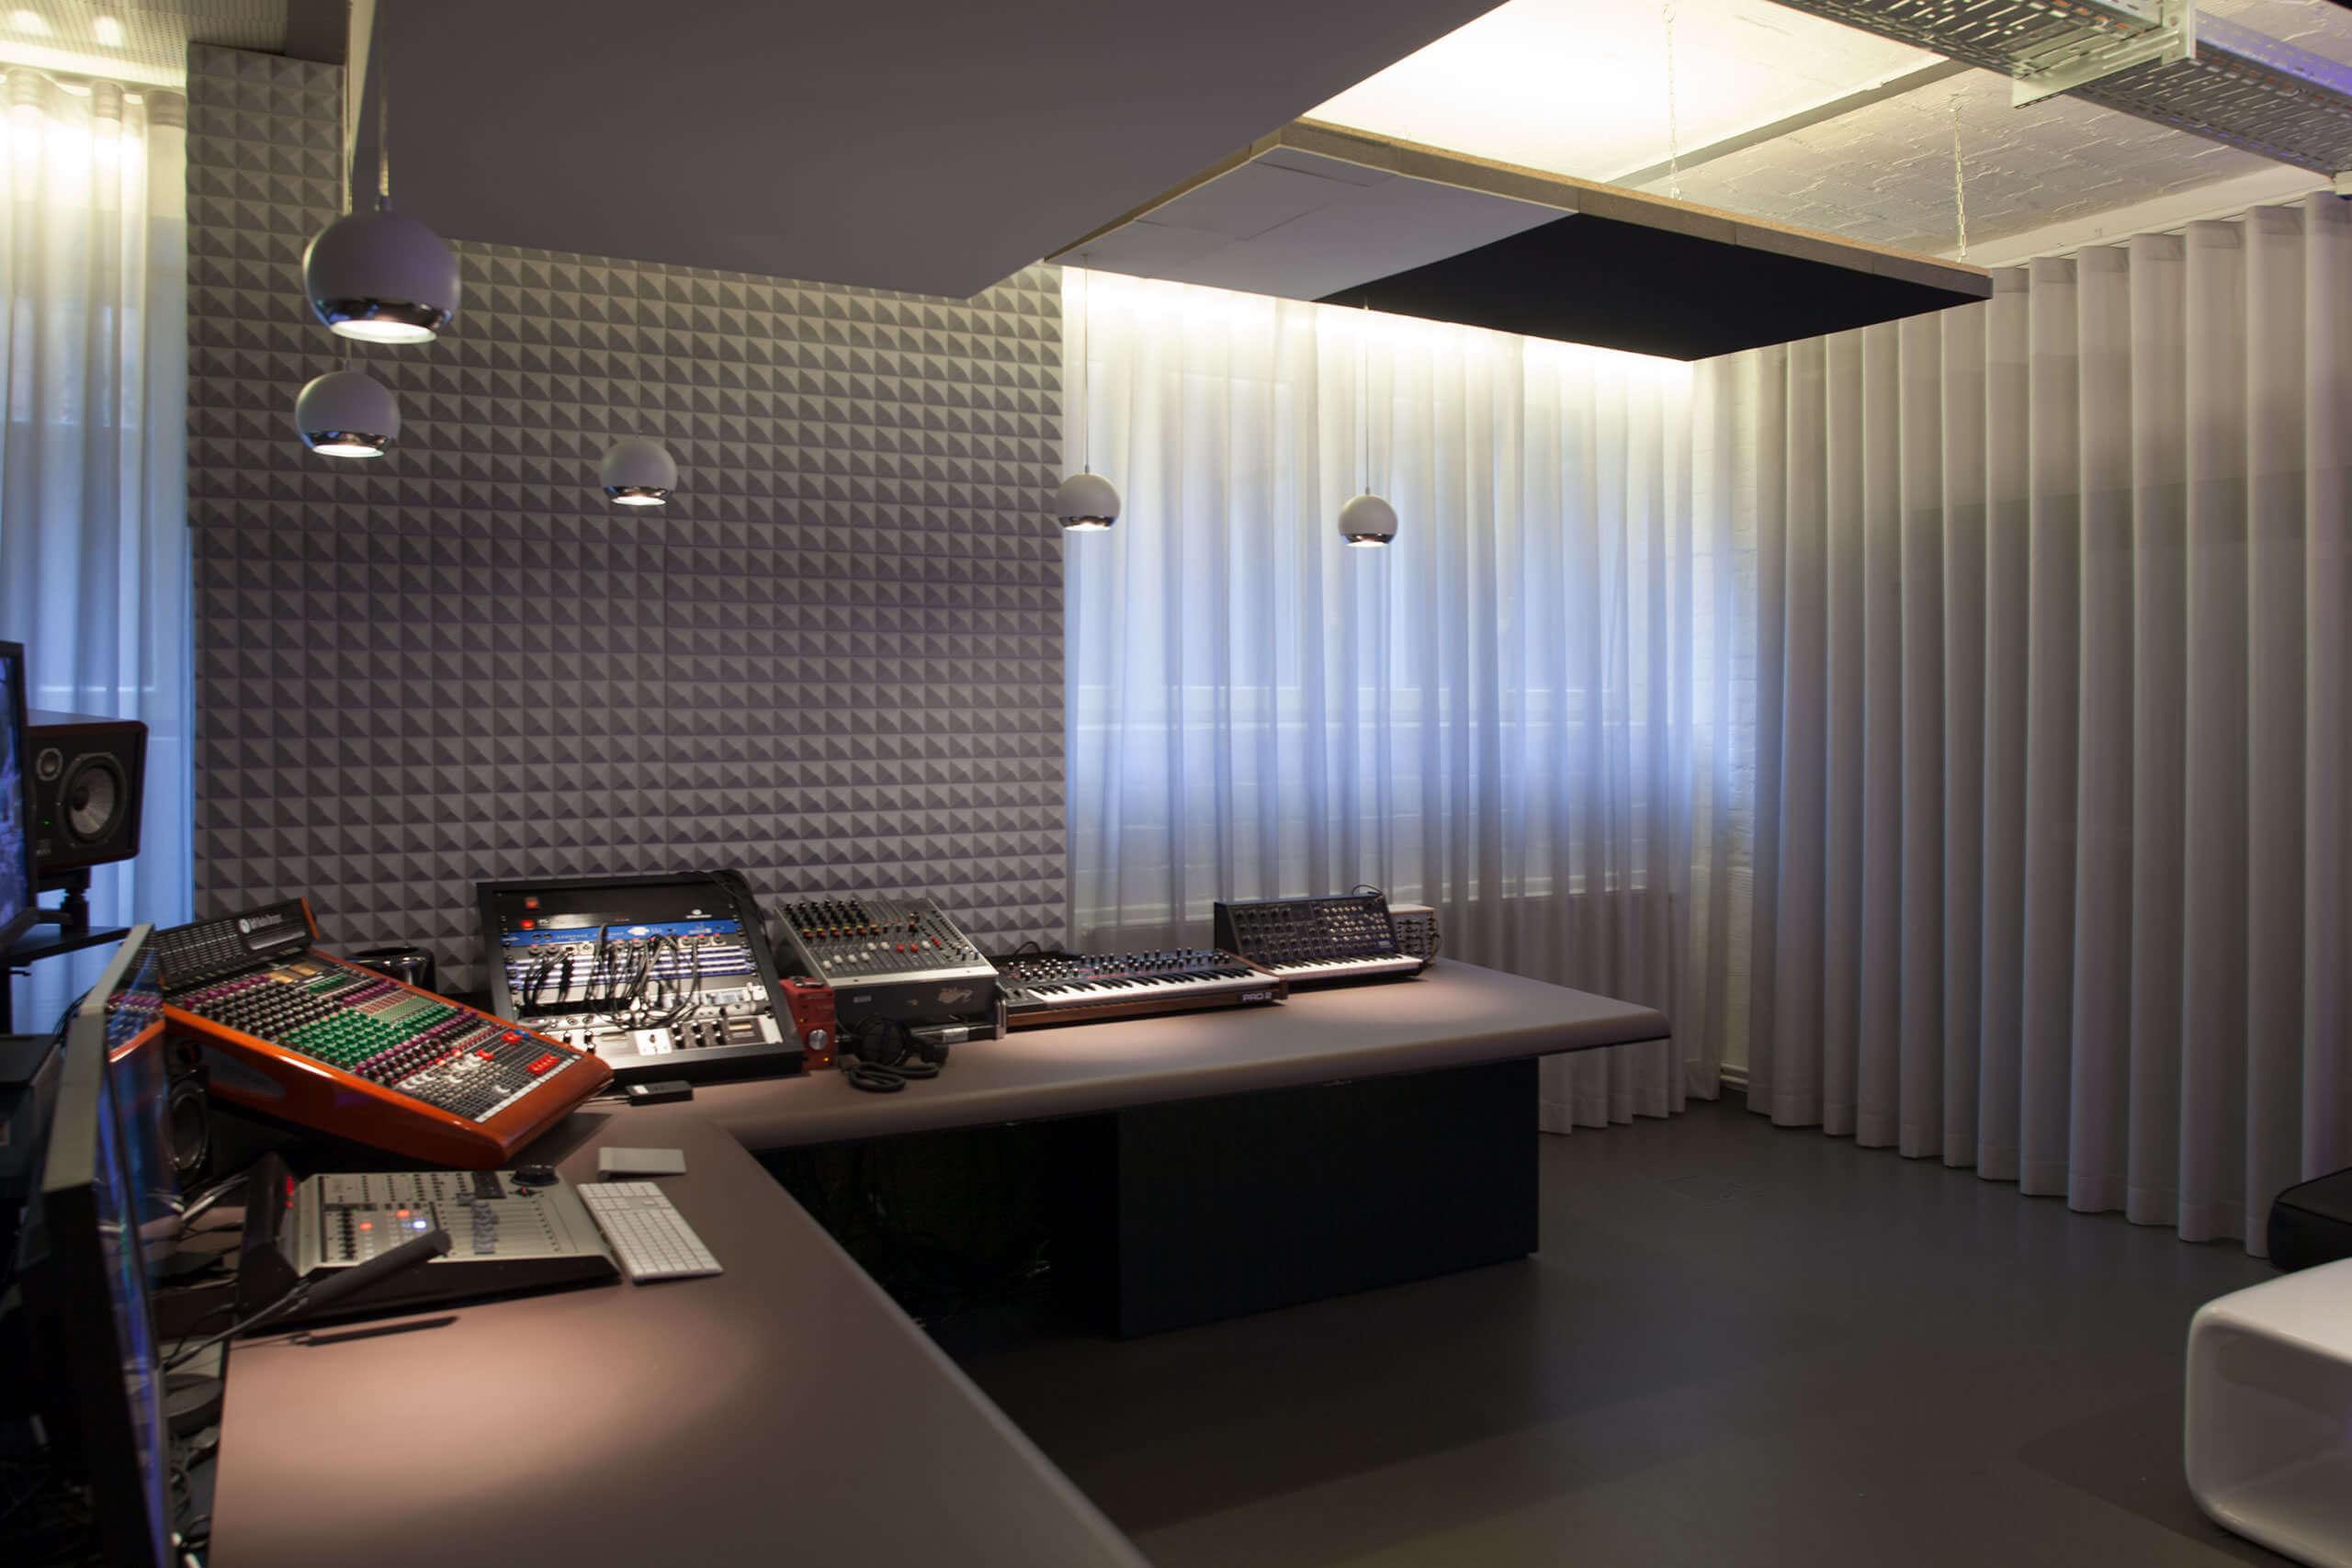 akustikstoffe f r rekorder studios berlin kreuzberg adler wohndesign. Black Bedroom Furniture Sets. Home Design Ideas